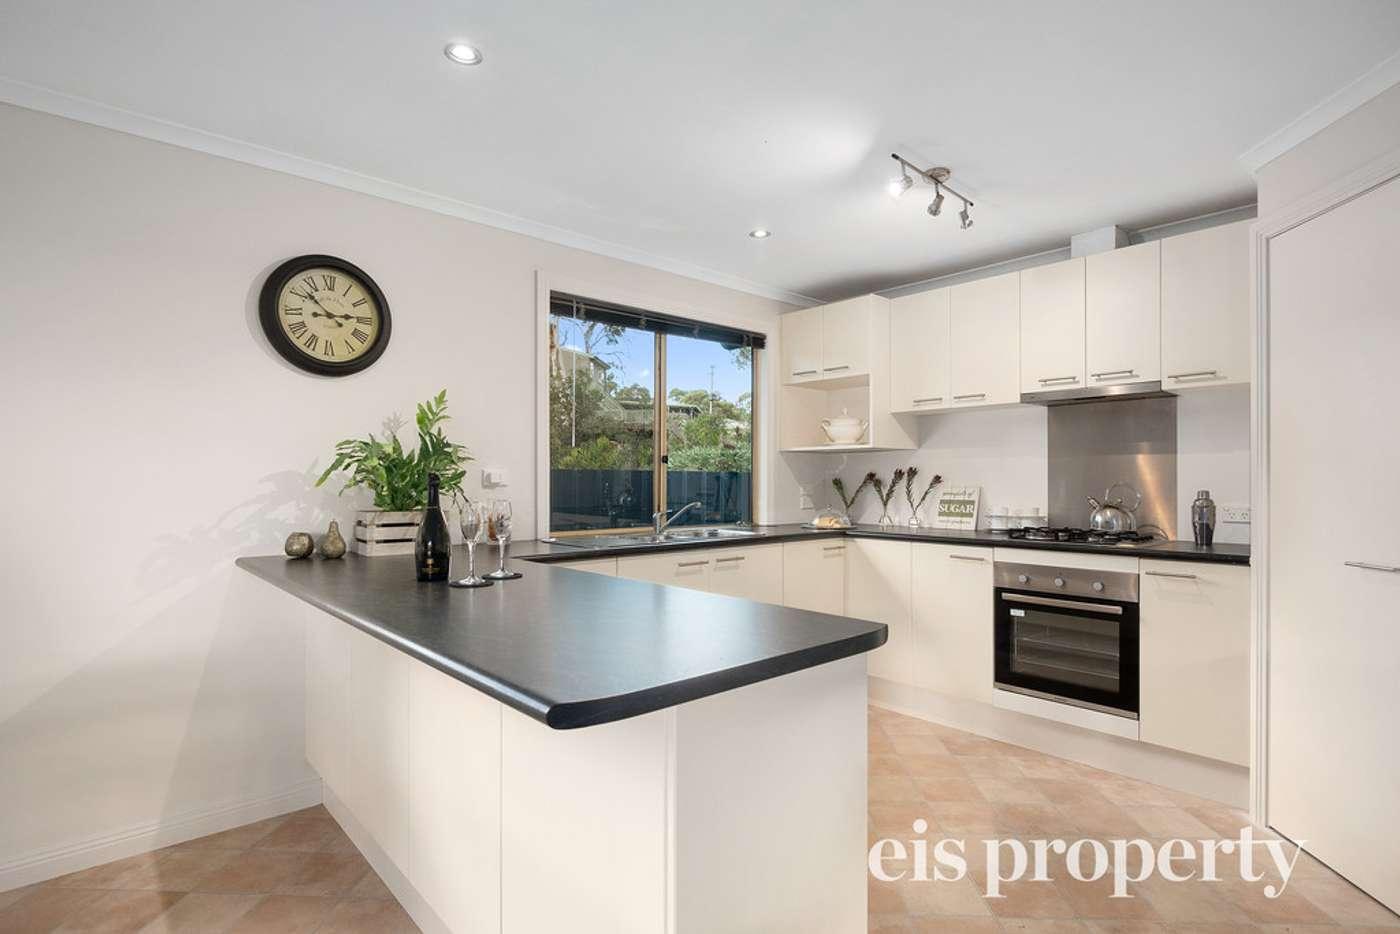 Fifth view of Homely house listing, 7 Plenar Street, Carlton TAS 7173